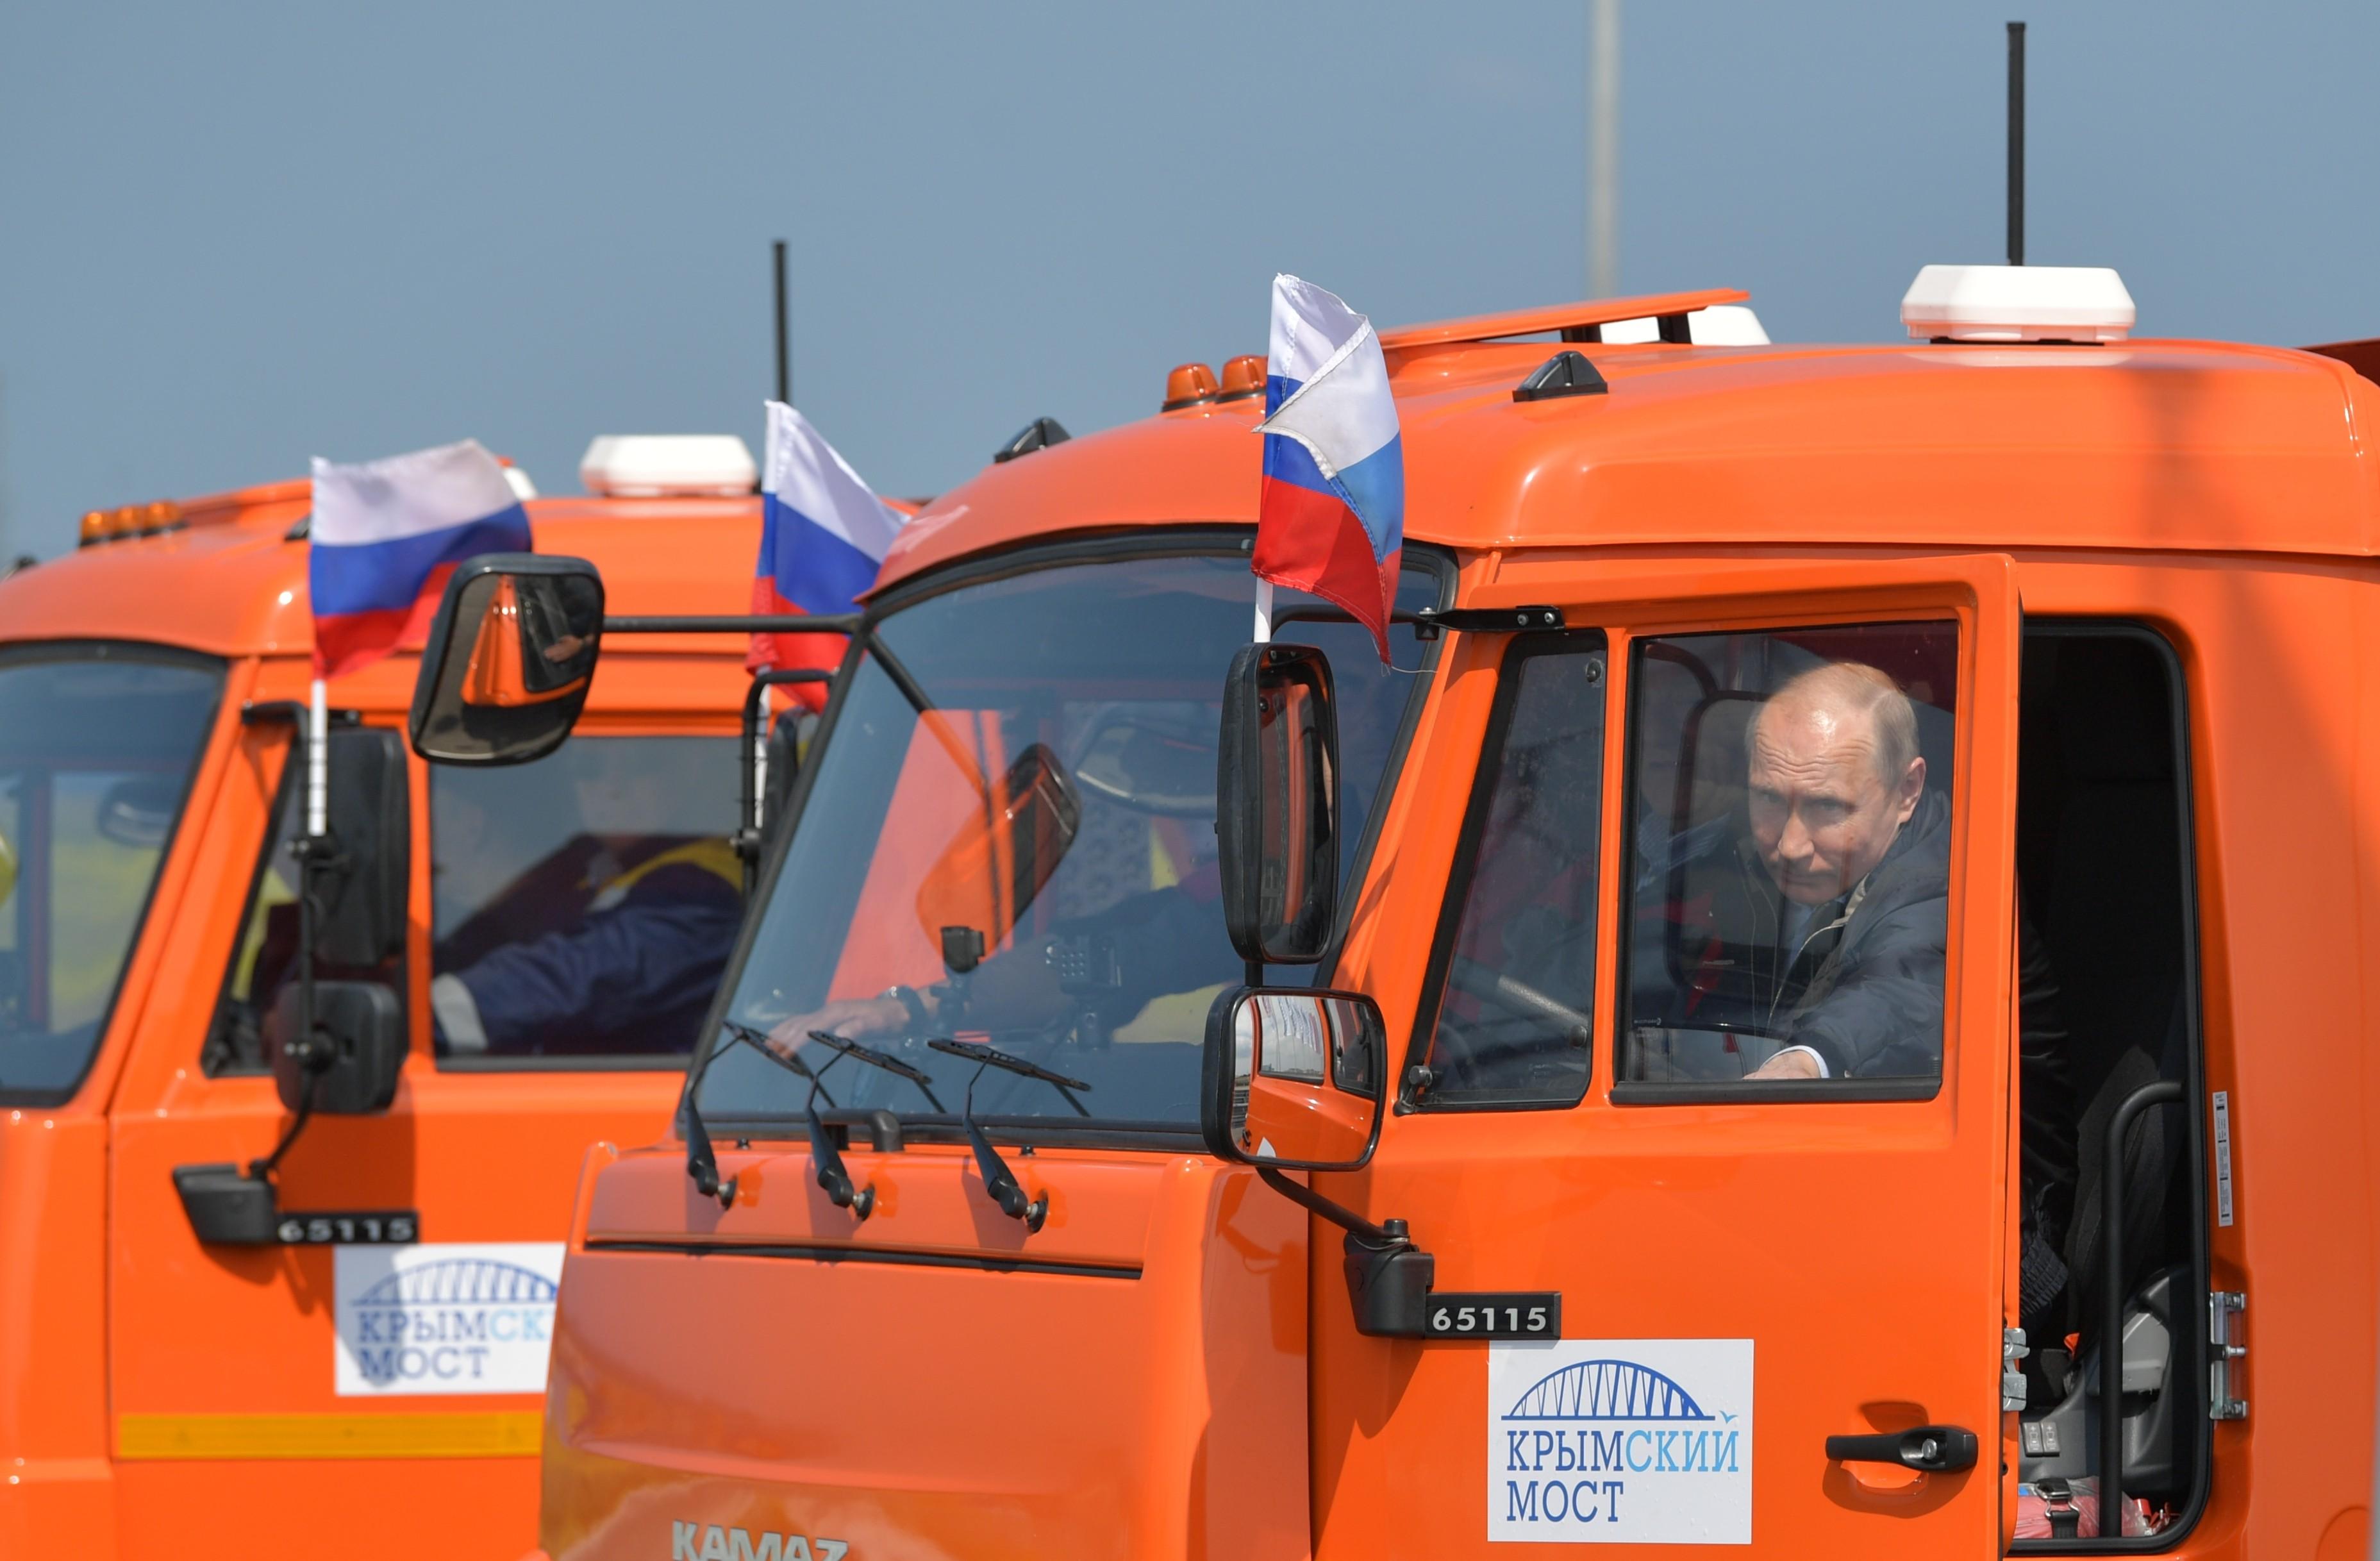 <p><span>Фото: &copy; РИА Новости/</span><span>&nbsp;</span>Алексей Дружинин</p>